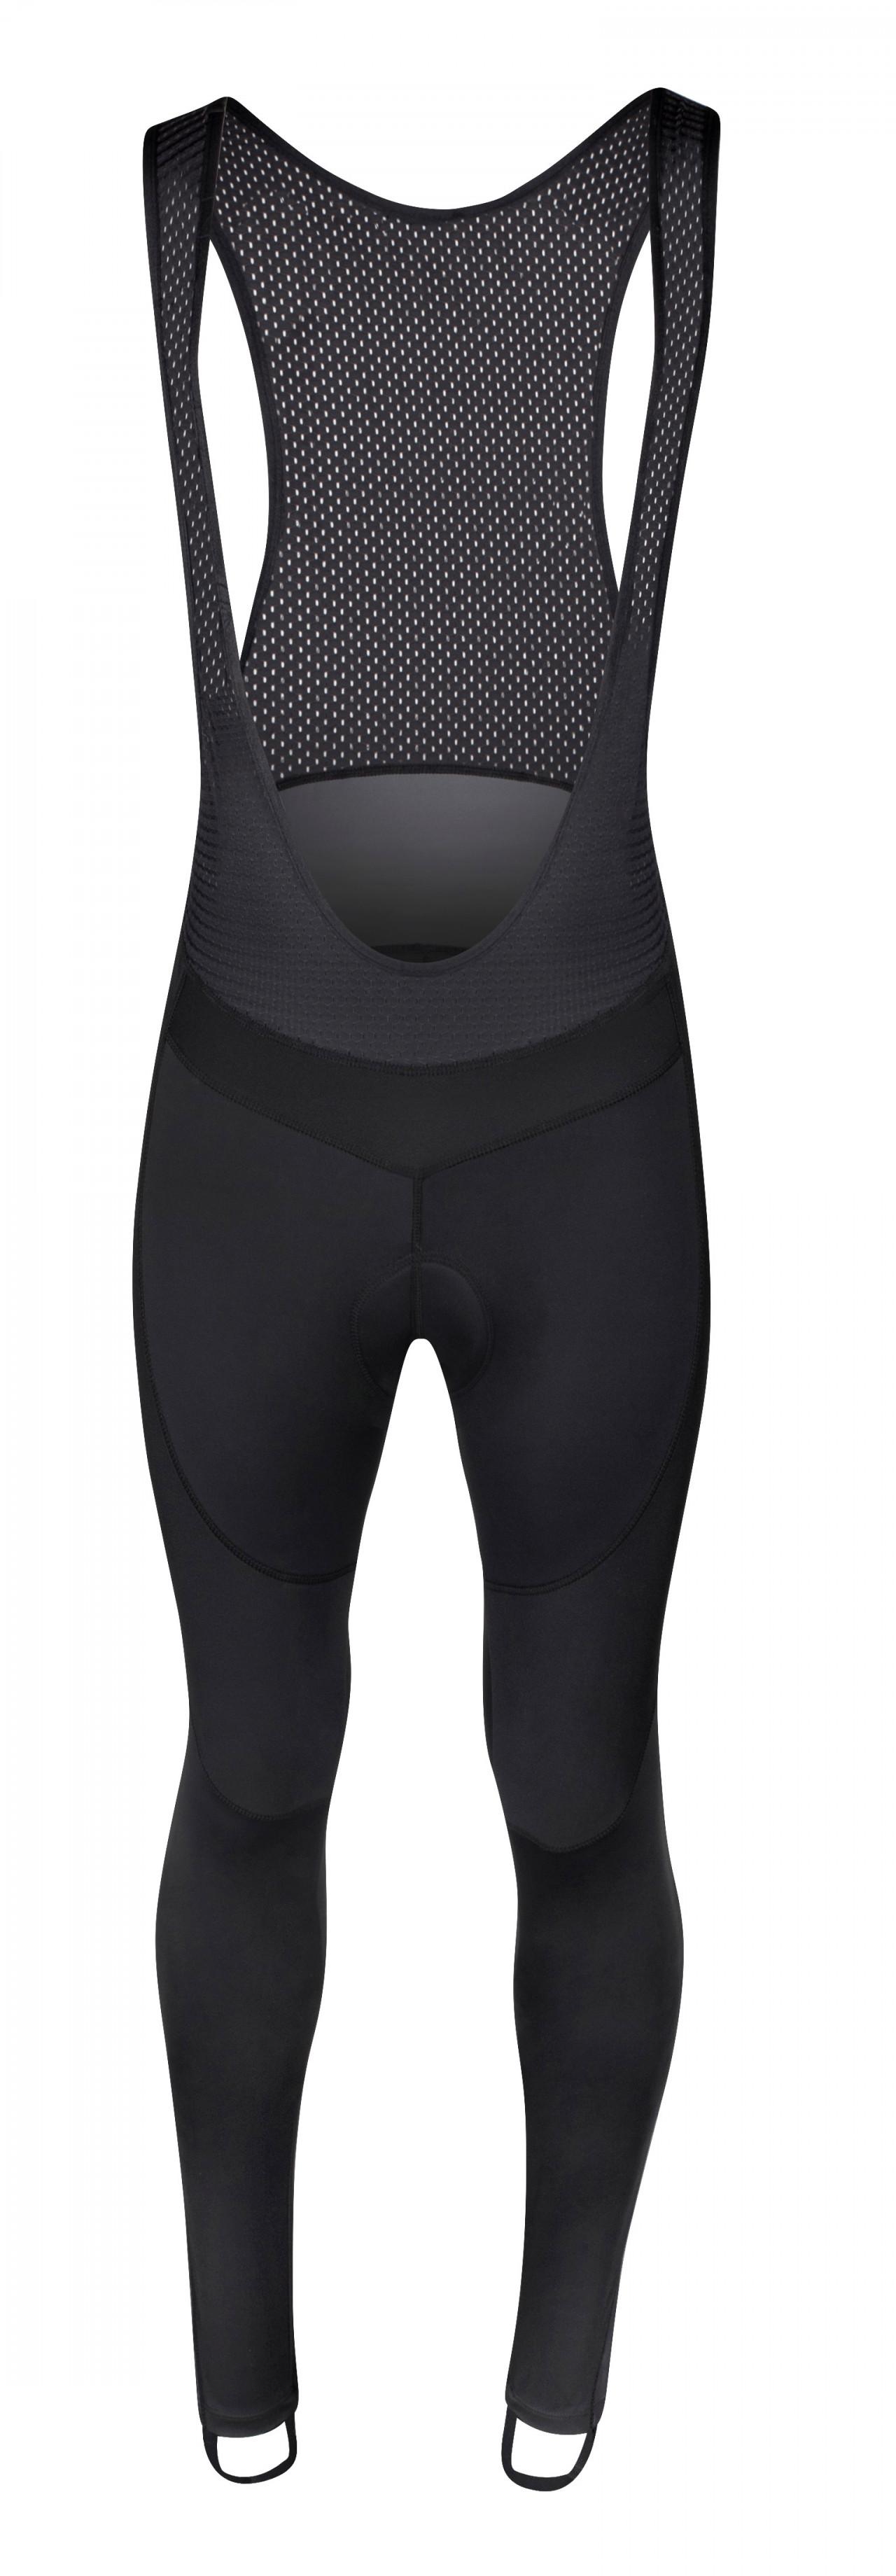 FORCE nohavice BRIGHT s trakmi a vložkou, čierne XXL